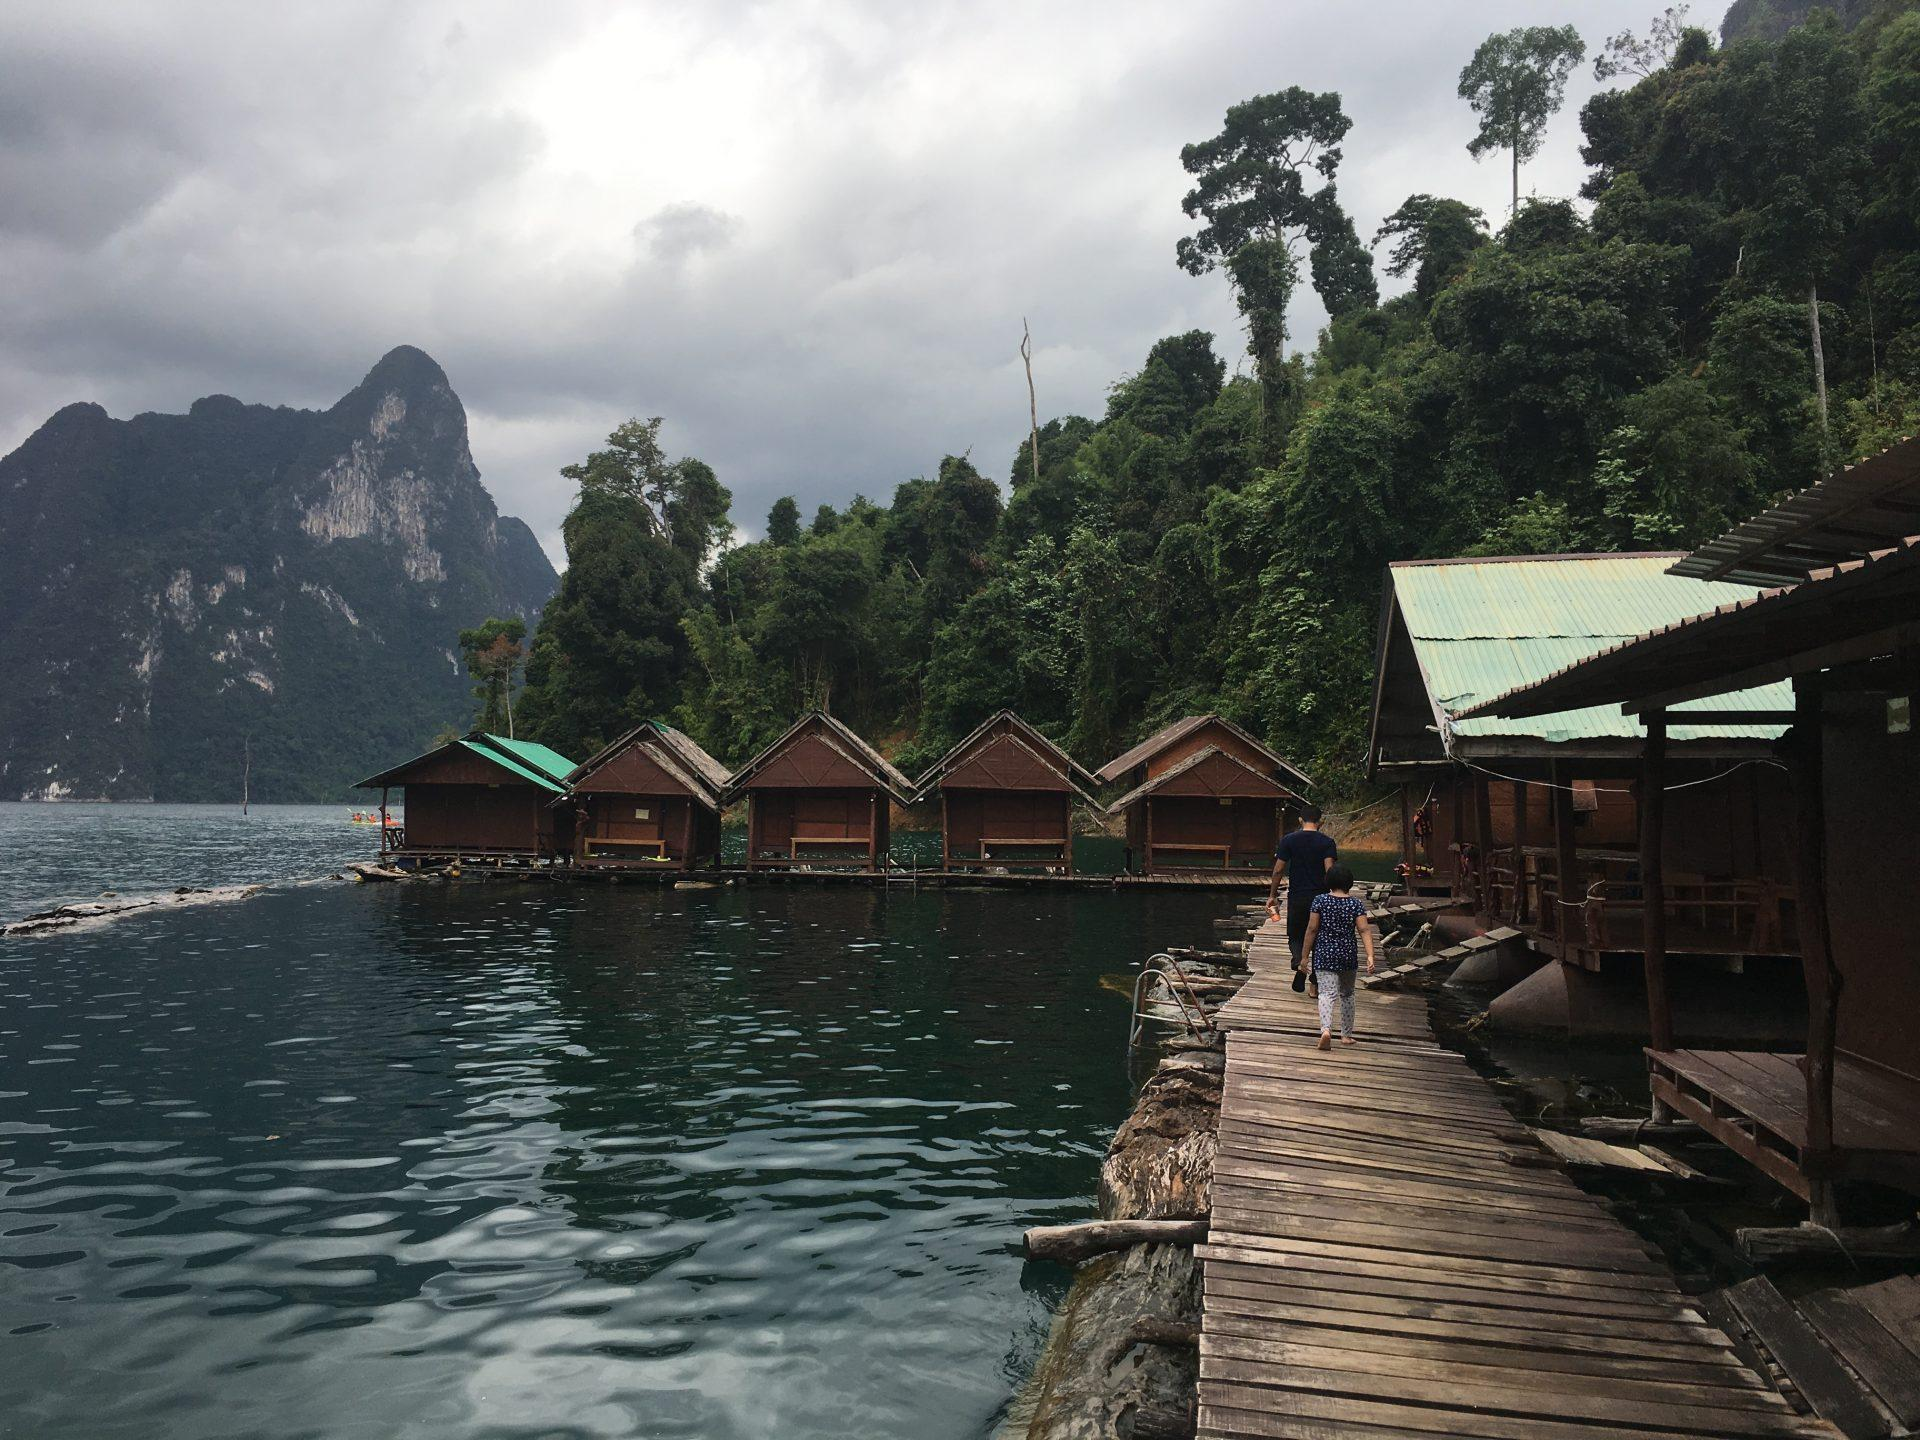 enostavne lesene hiške na leasenem pomolu brez elektrike na jezeru Khao Sok - Tajska